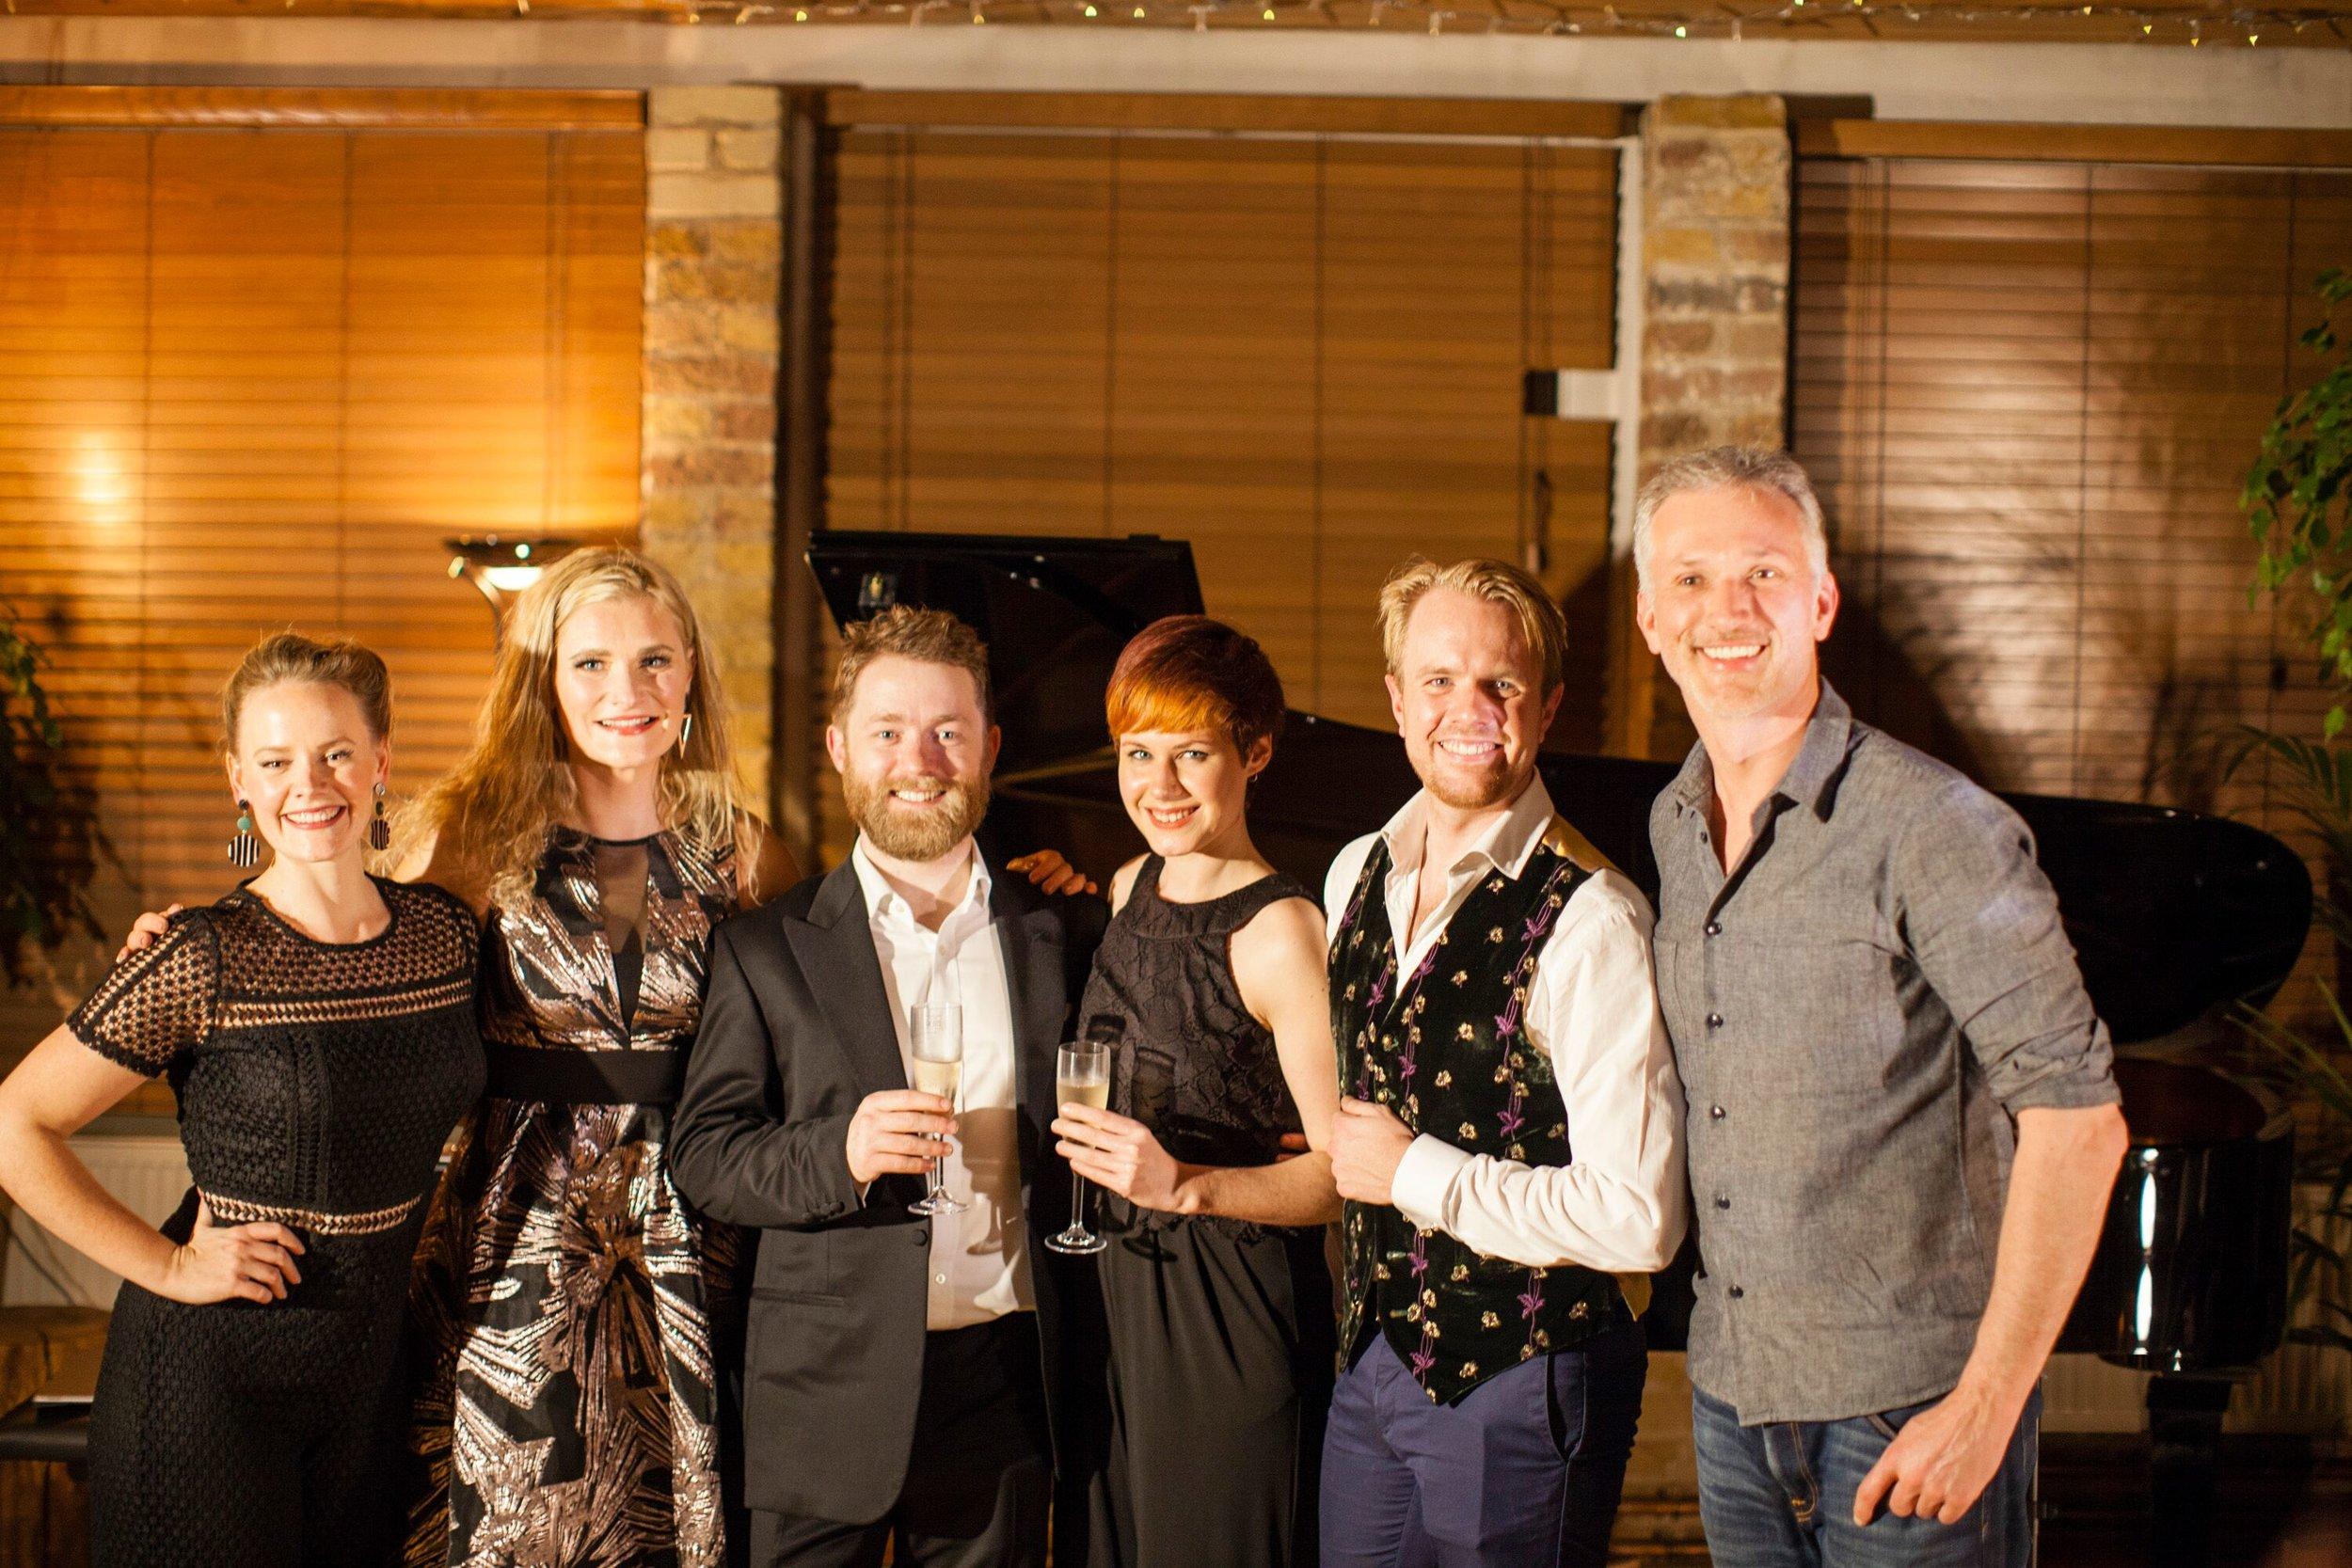 DEBUT at Shoreditch Treehouse Secret Concert Lizzie Holmes, Chad Vindin, Lisa Bucknell, Morgan Pearse.jpeg